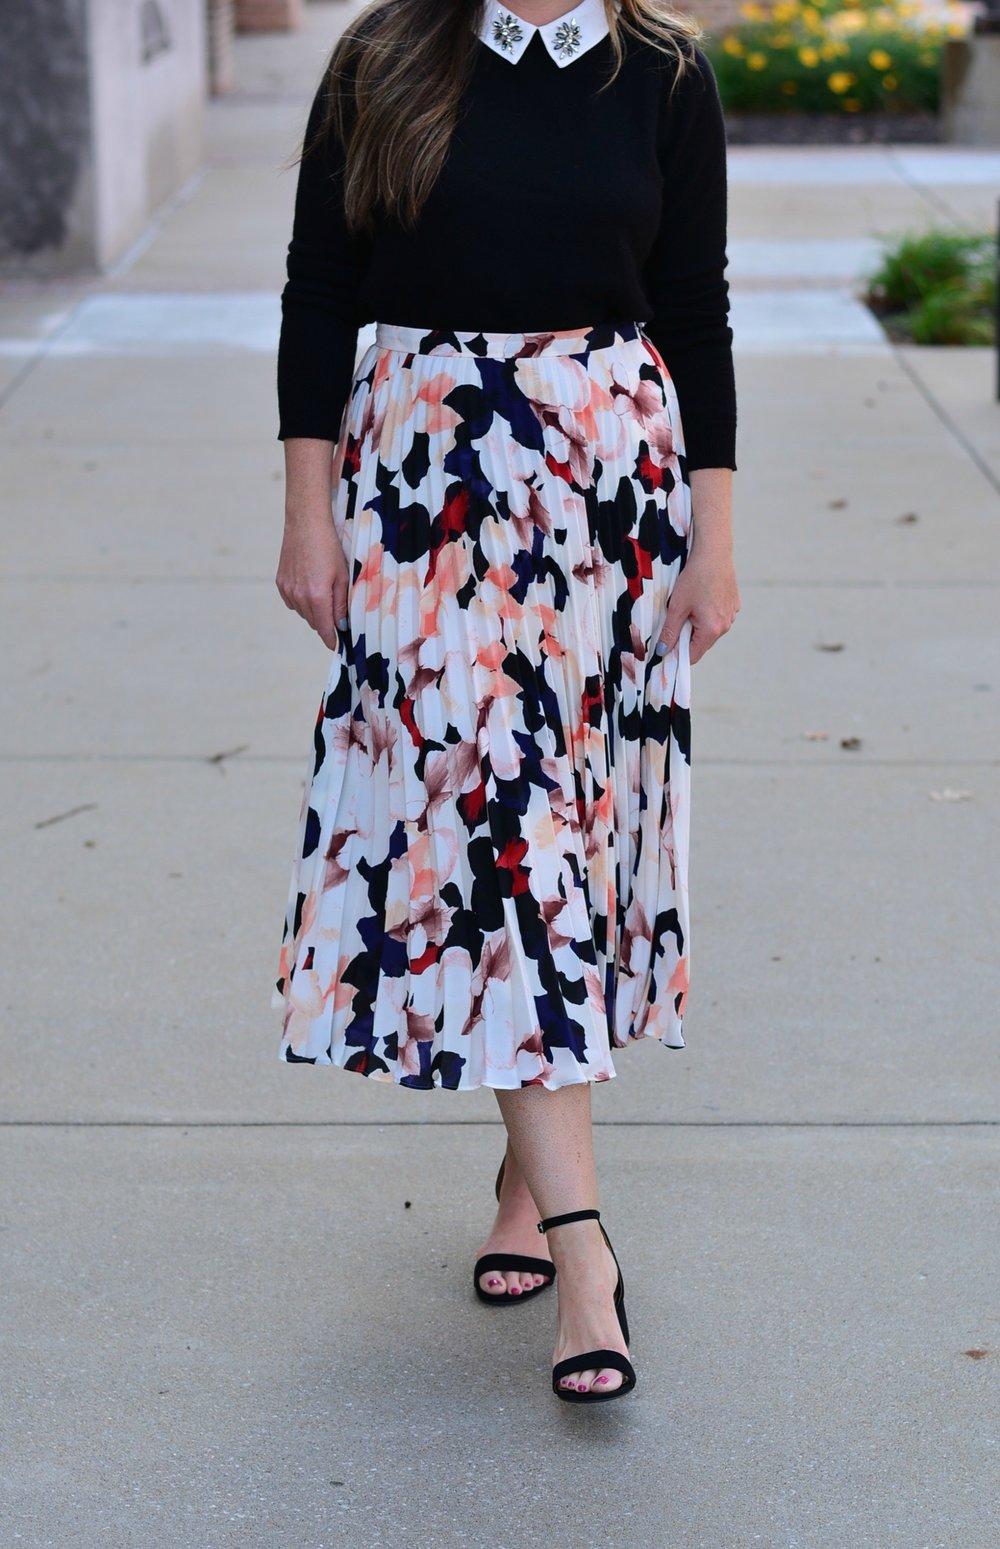 Printed skirt for fall